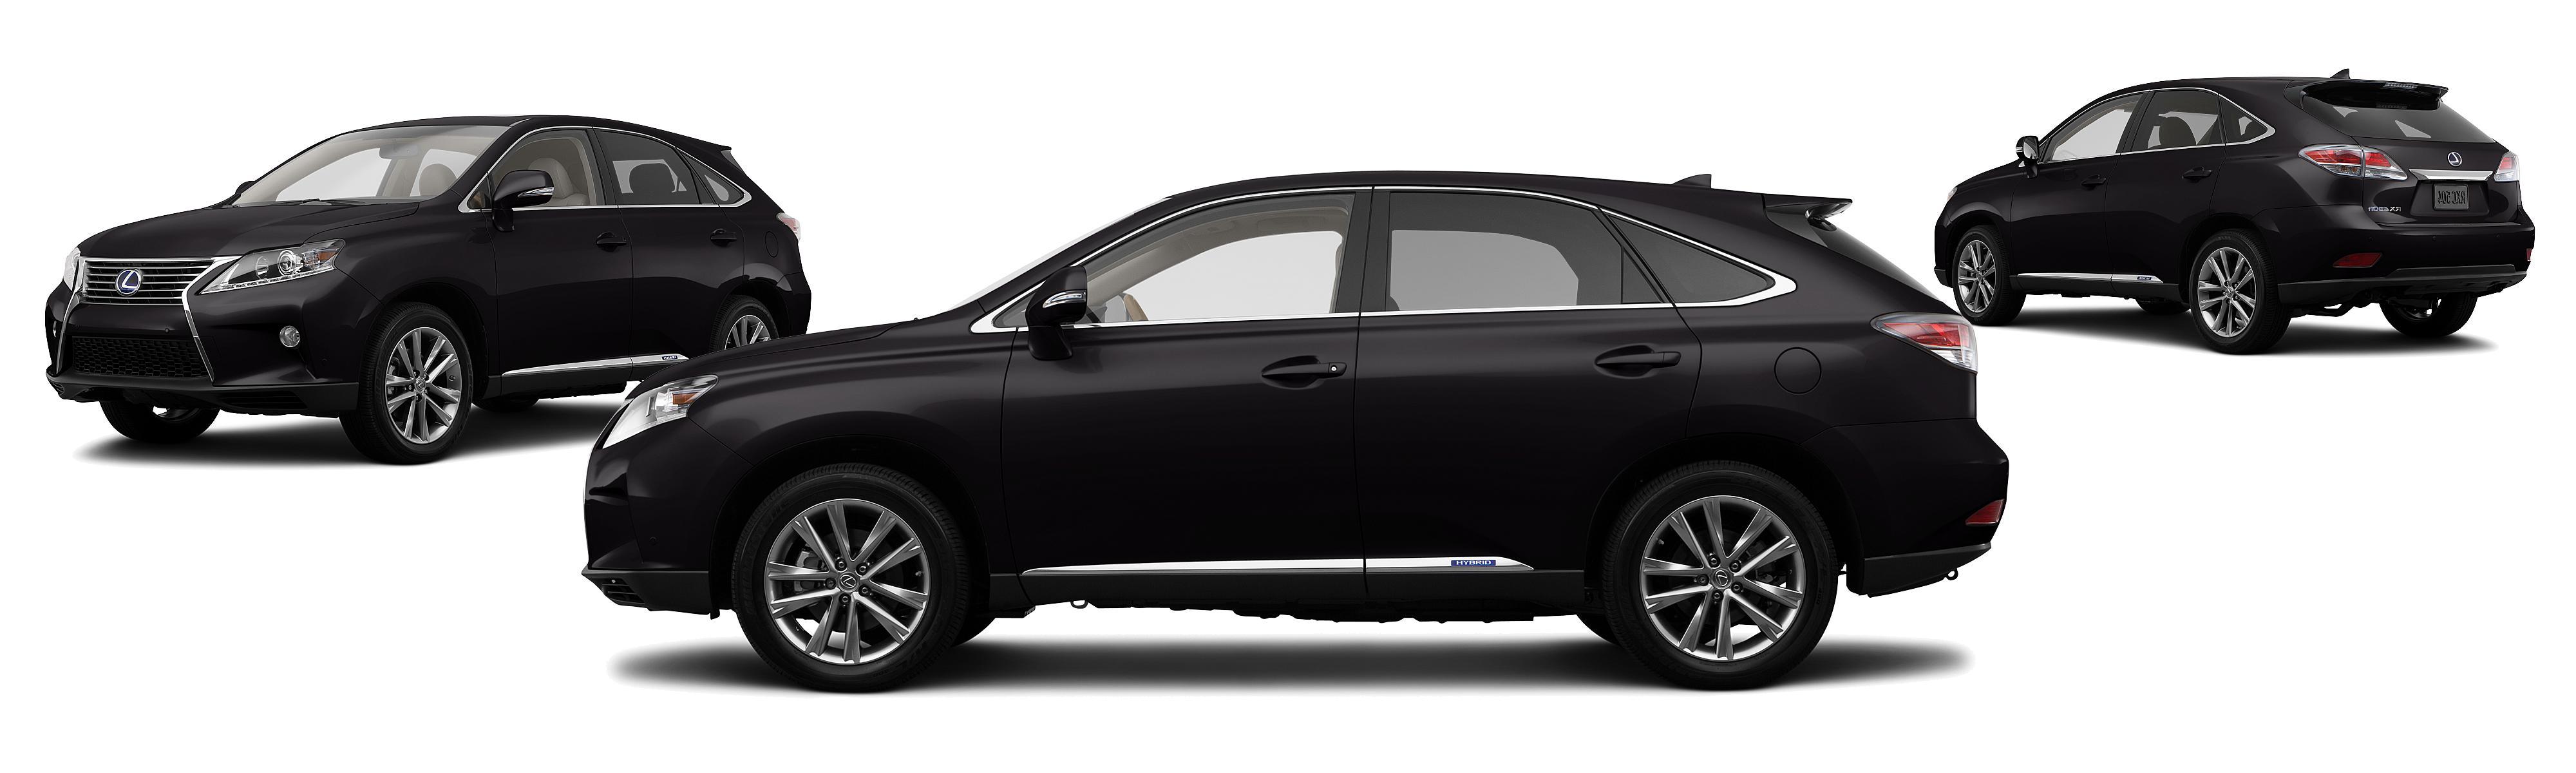 rx bonita lexus cars used home wholesale westcoast auto to